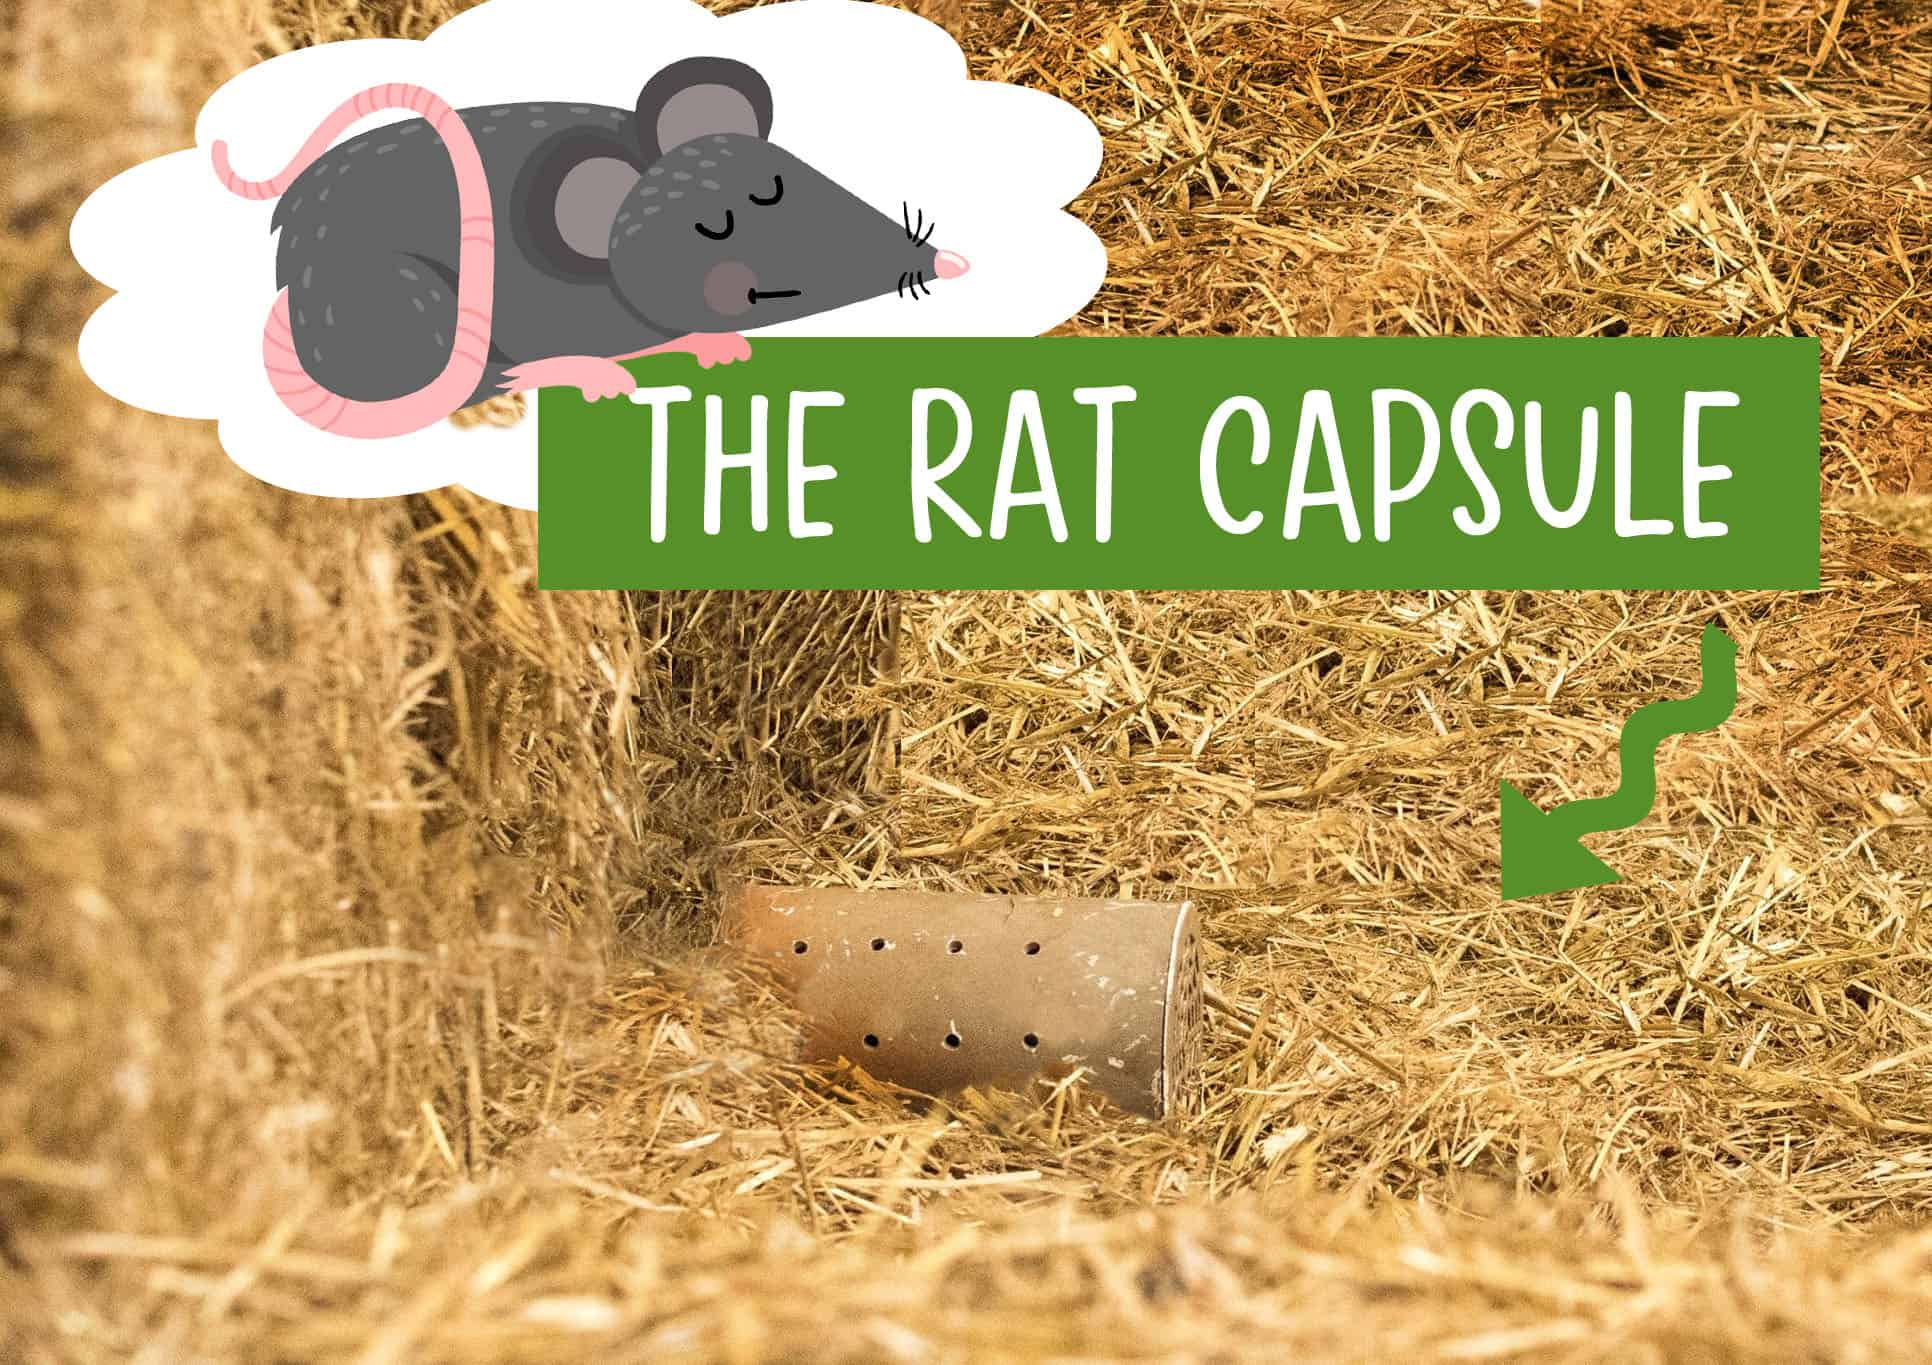 shiba inu barn hunt rat capsule